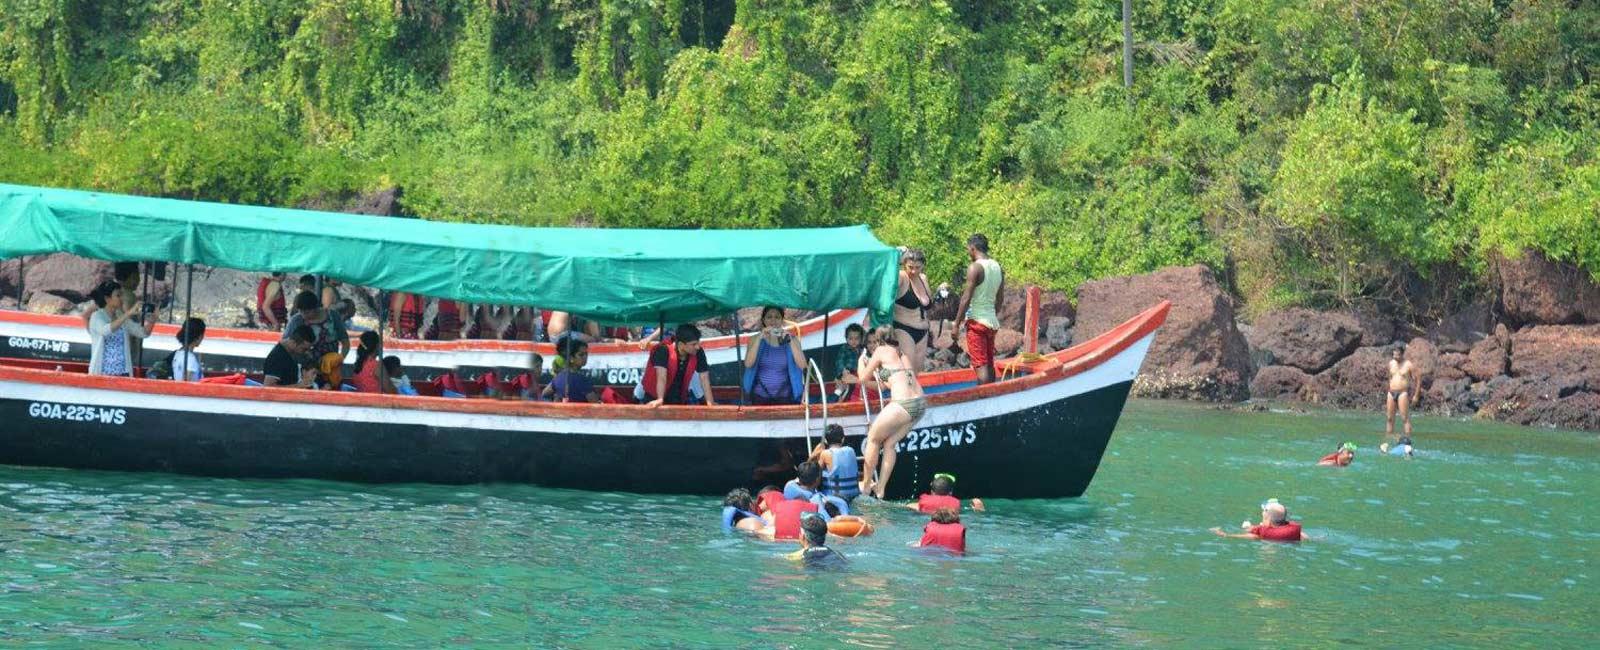 Snorkeling Island Boat Tour